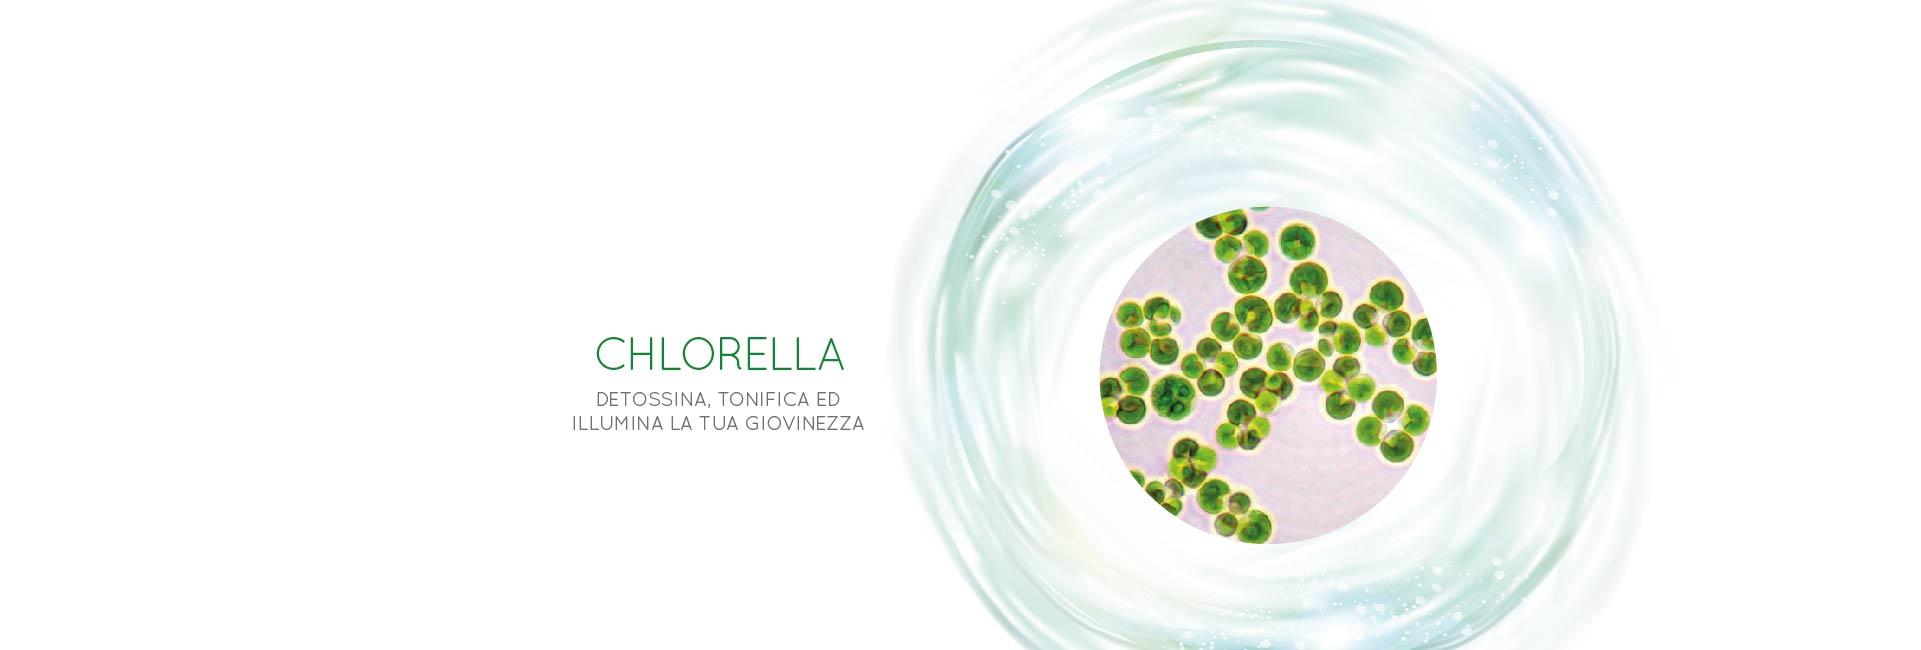 dermoalgae-bellezza-viso_chlorella